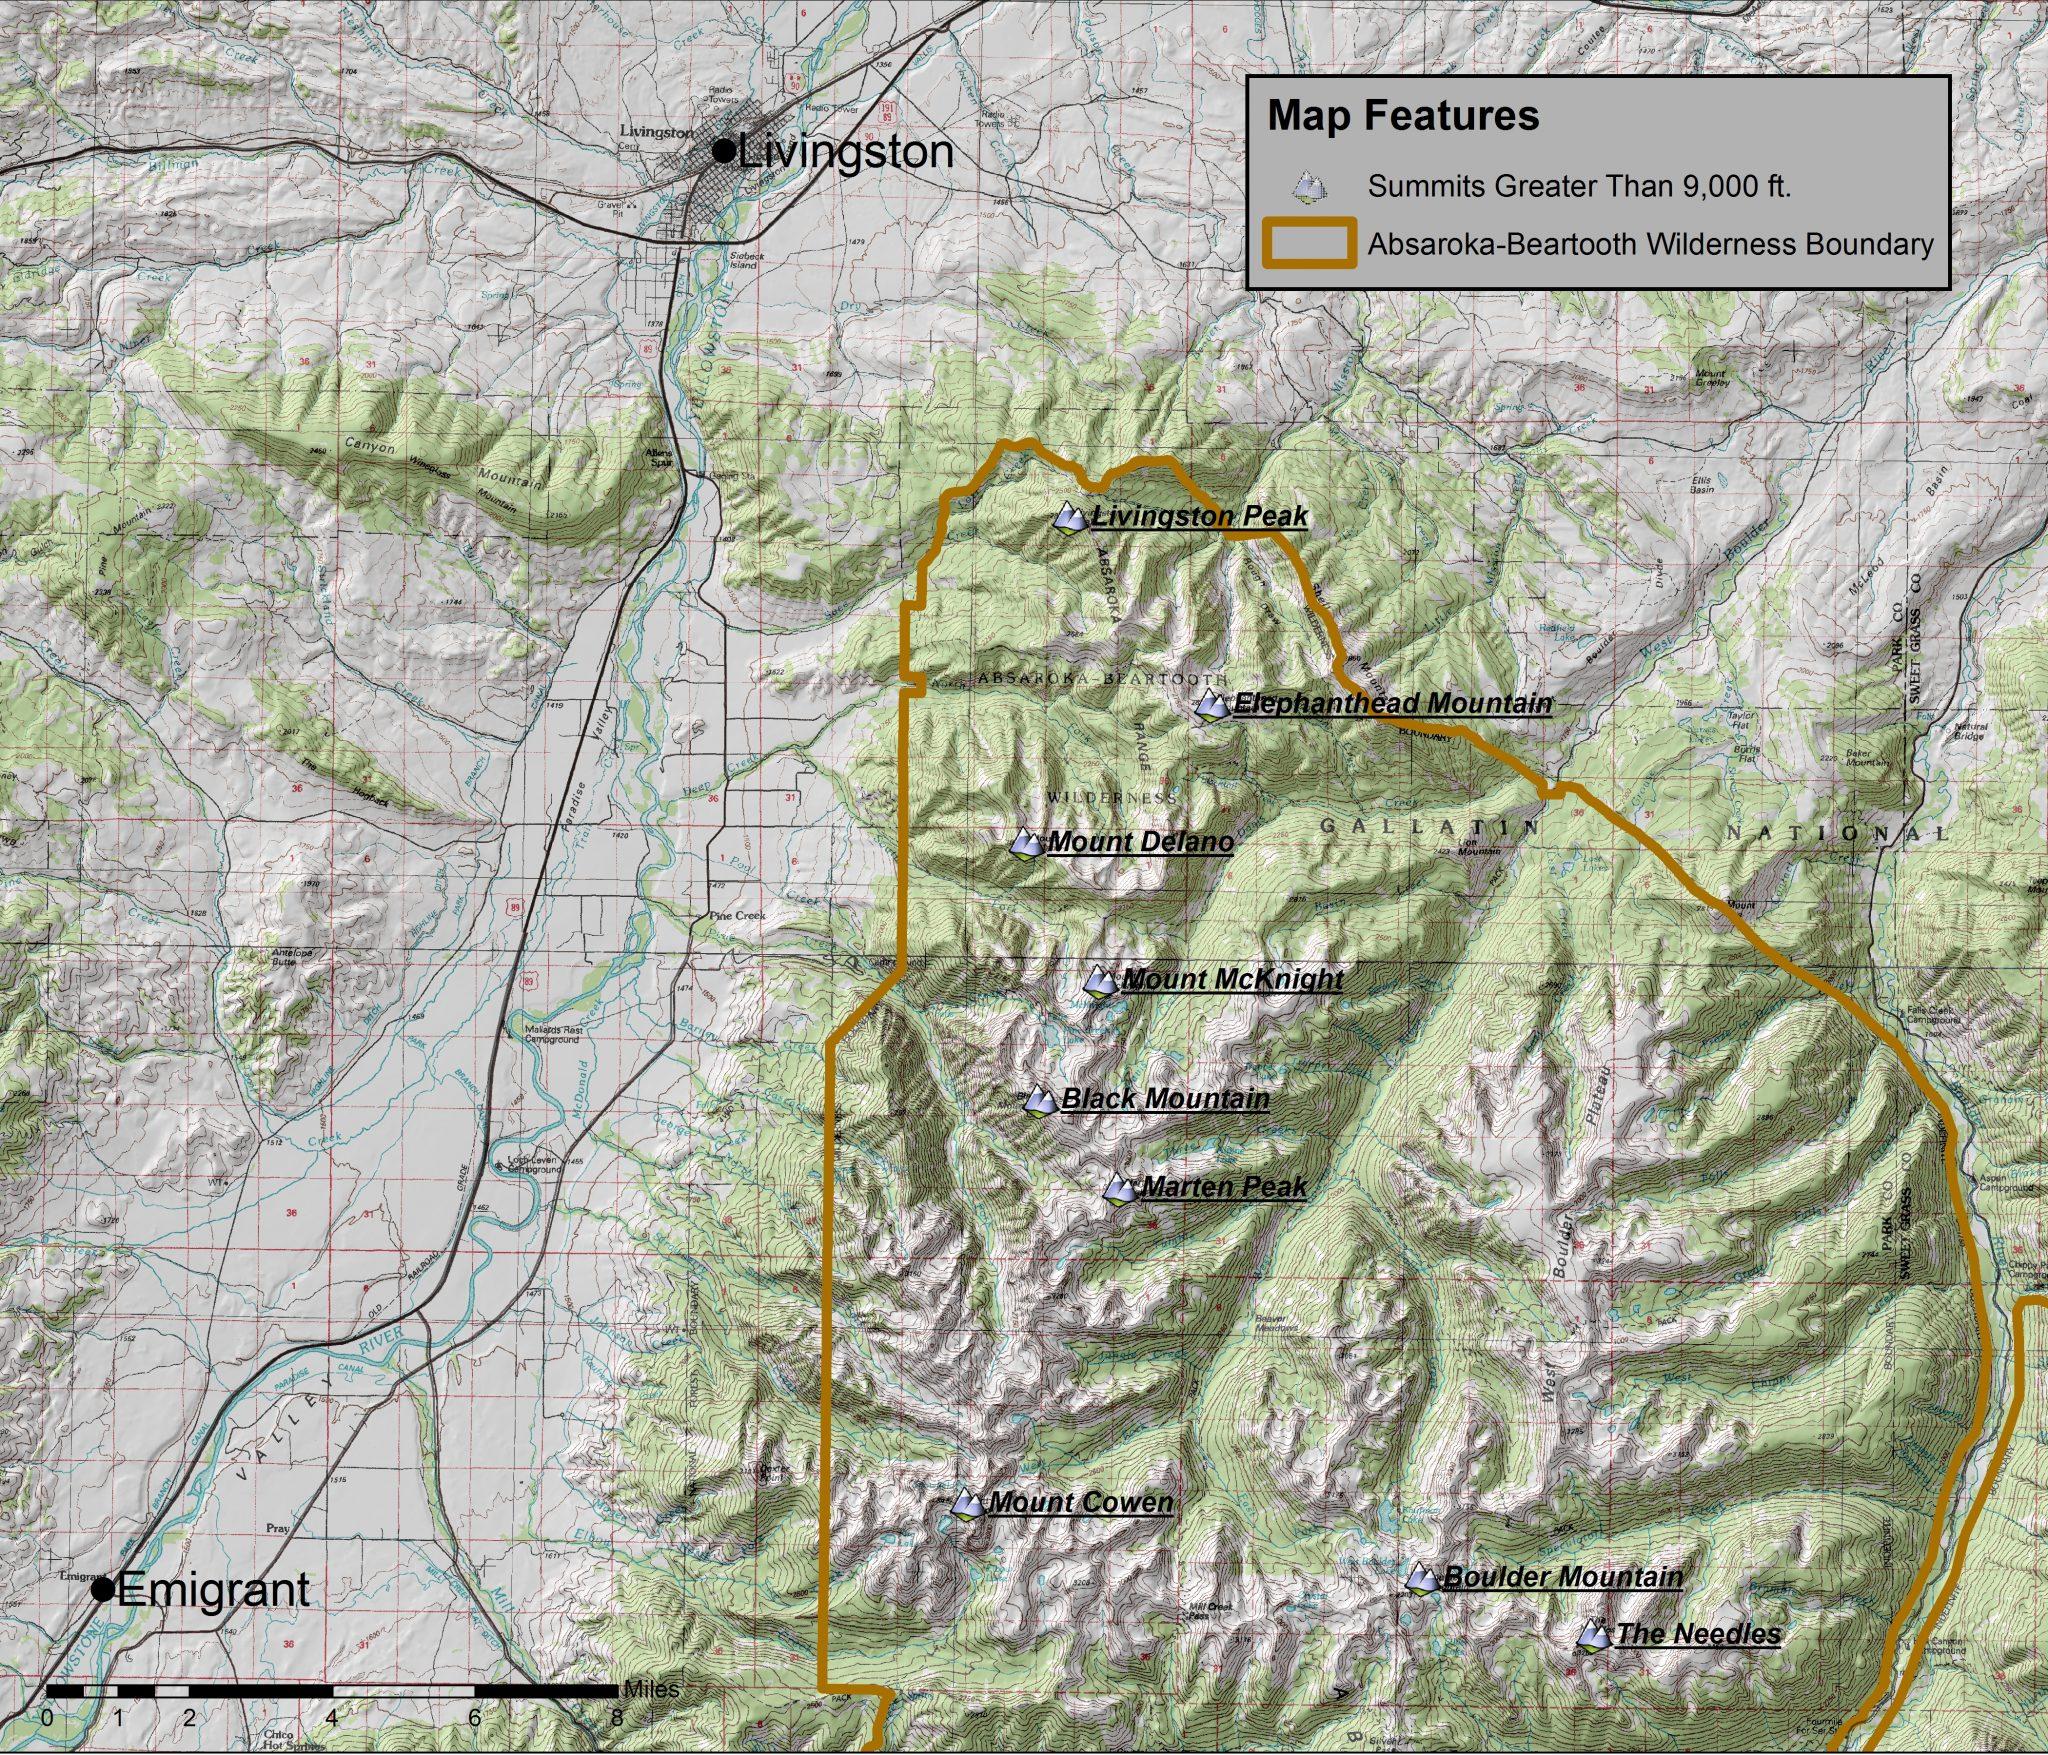 The Edge of Wilderness - Atlas of the Absaroka-Beartooth ...